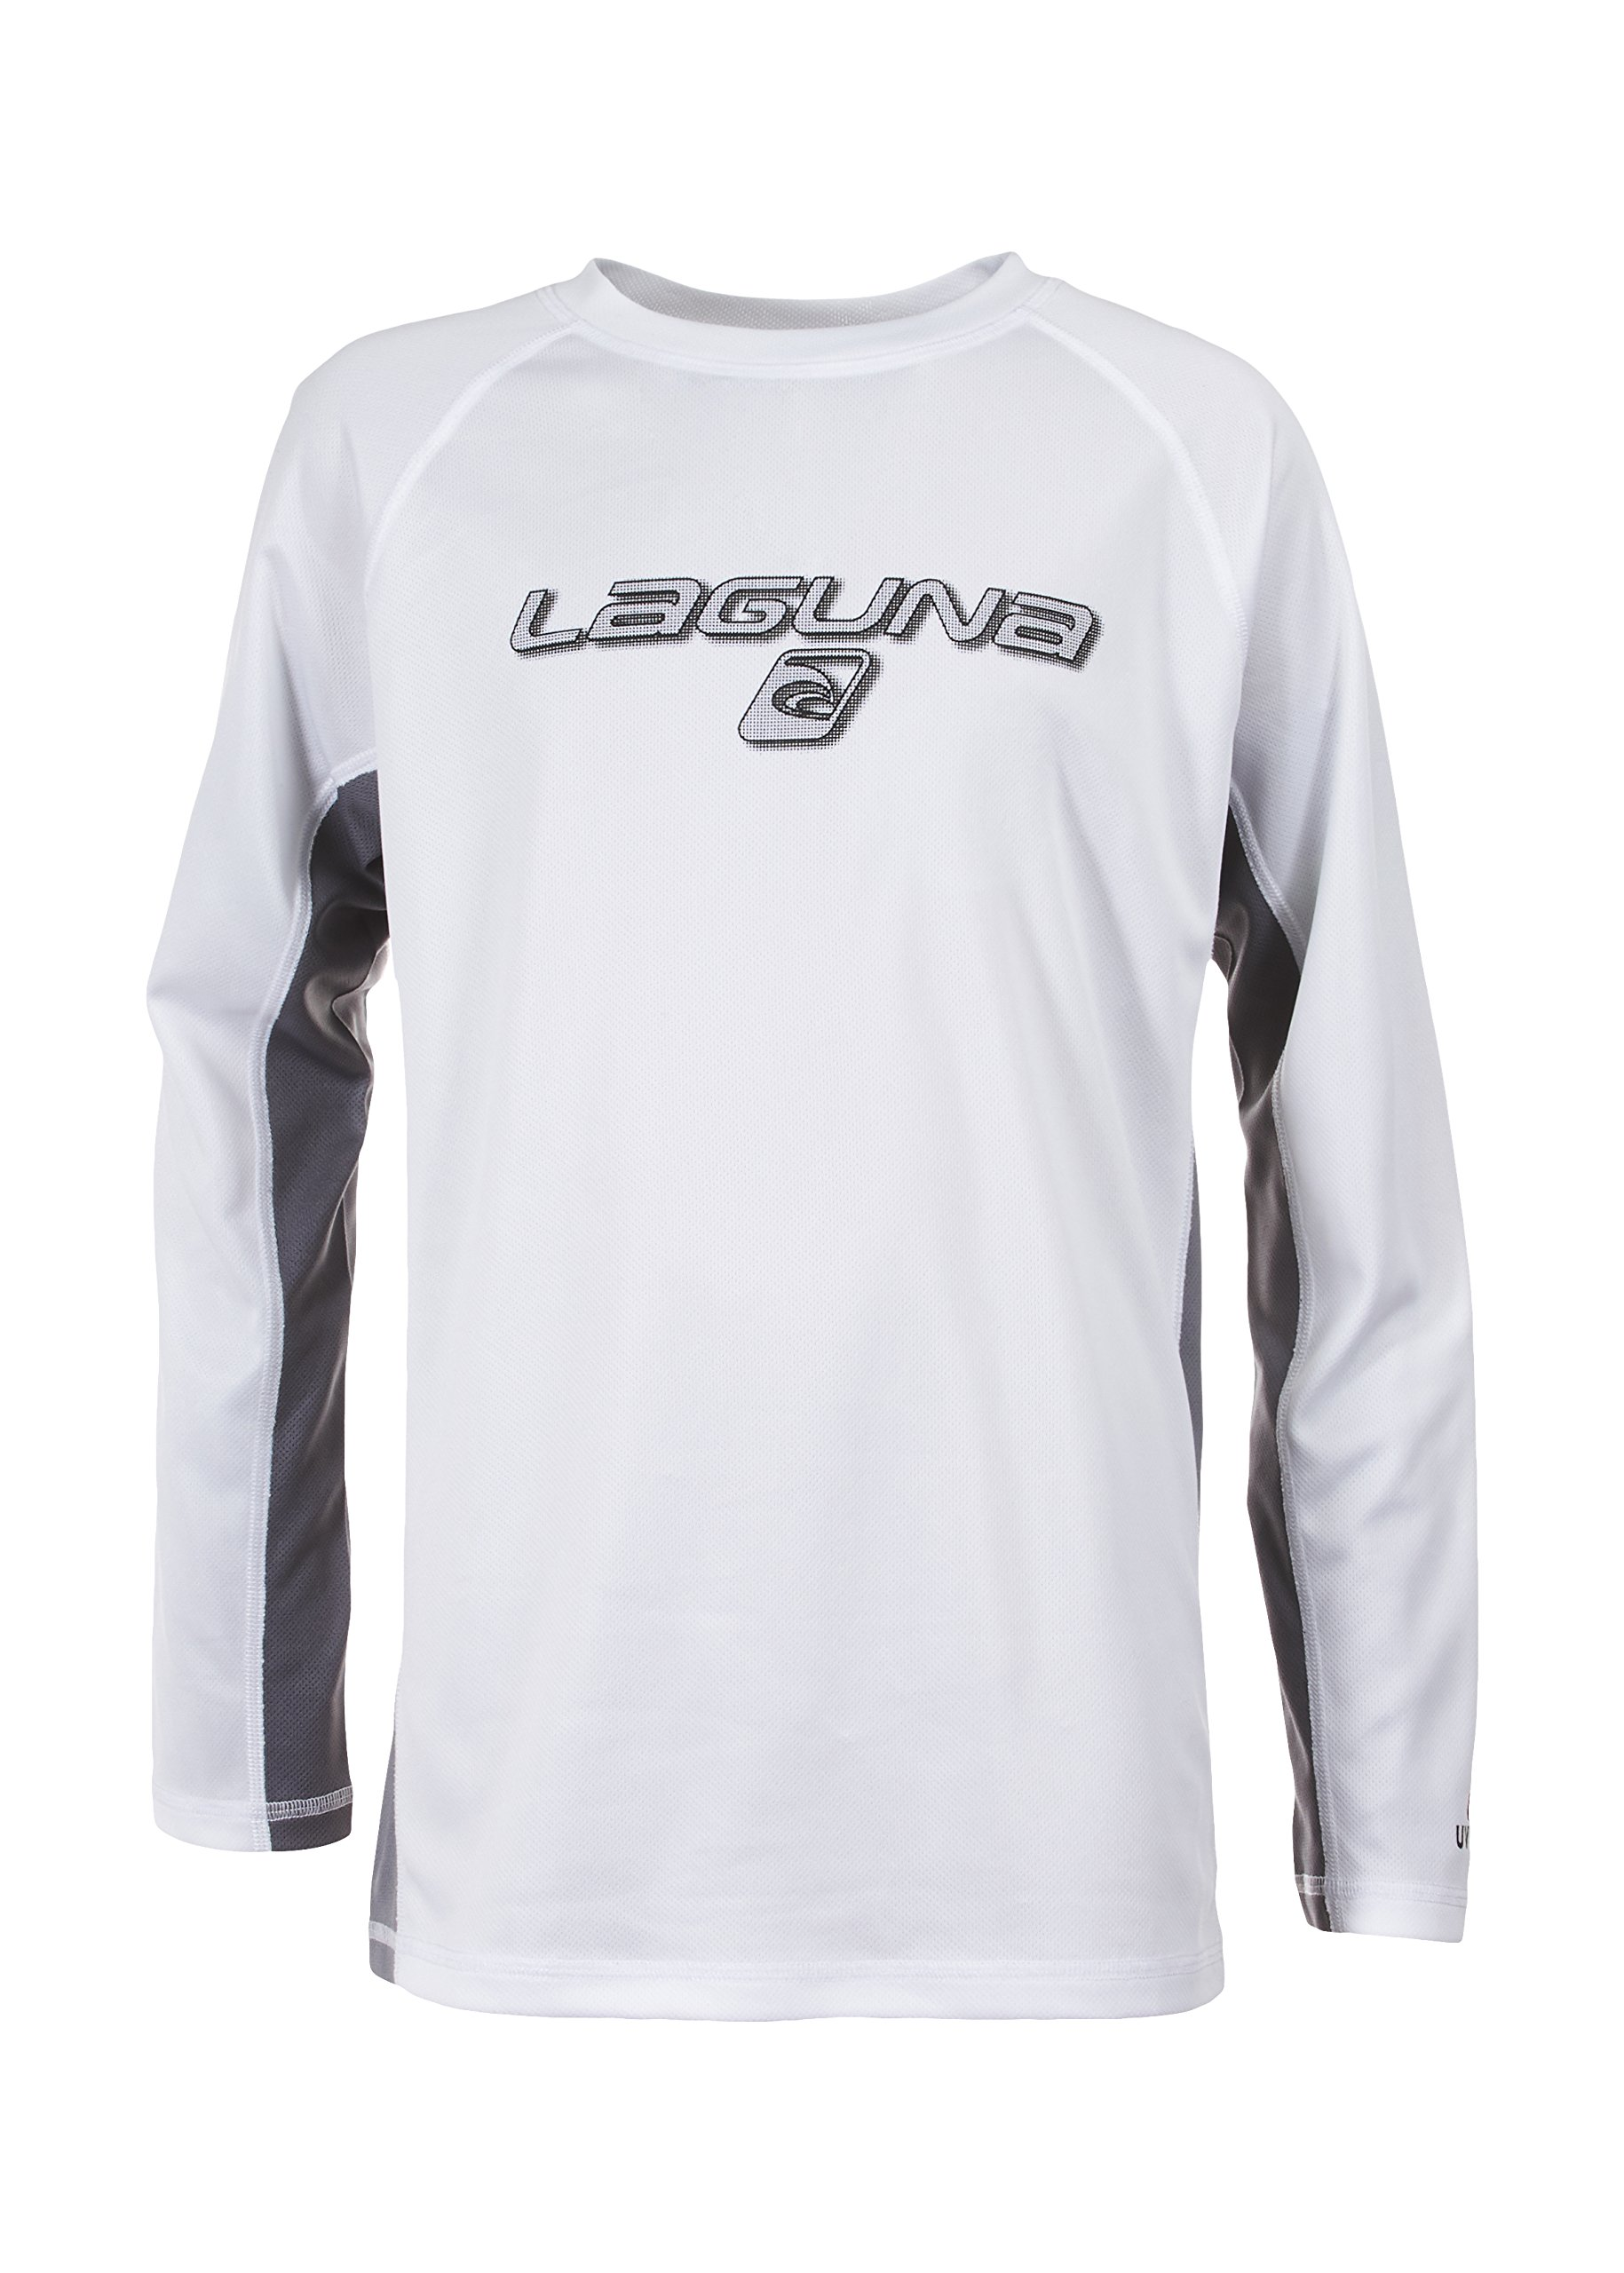 Laguna Children's Surf Beat Loose Fit Long Sleeve Rashguard Swimwear, White, 14/16